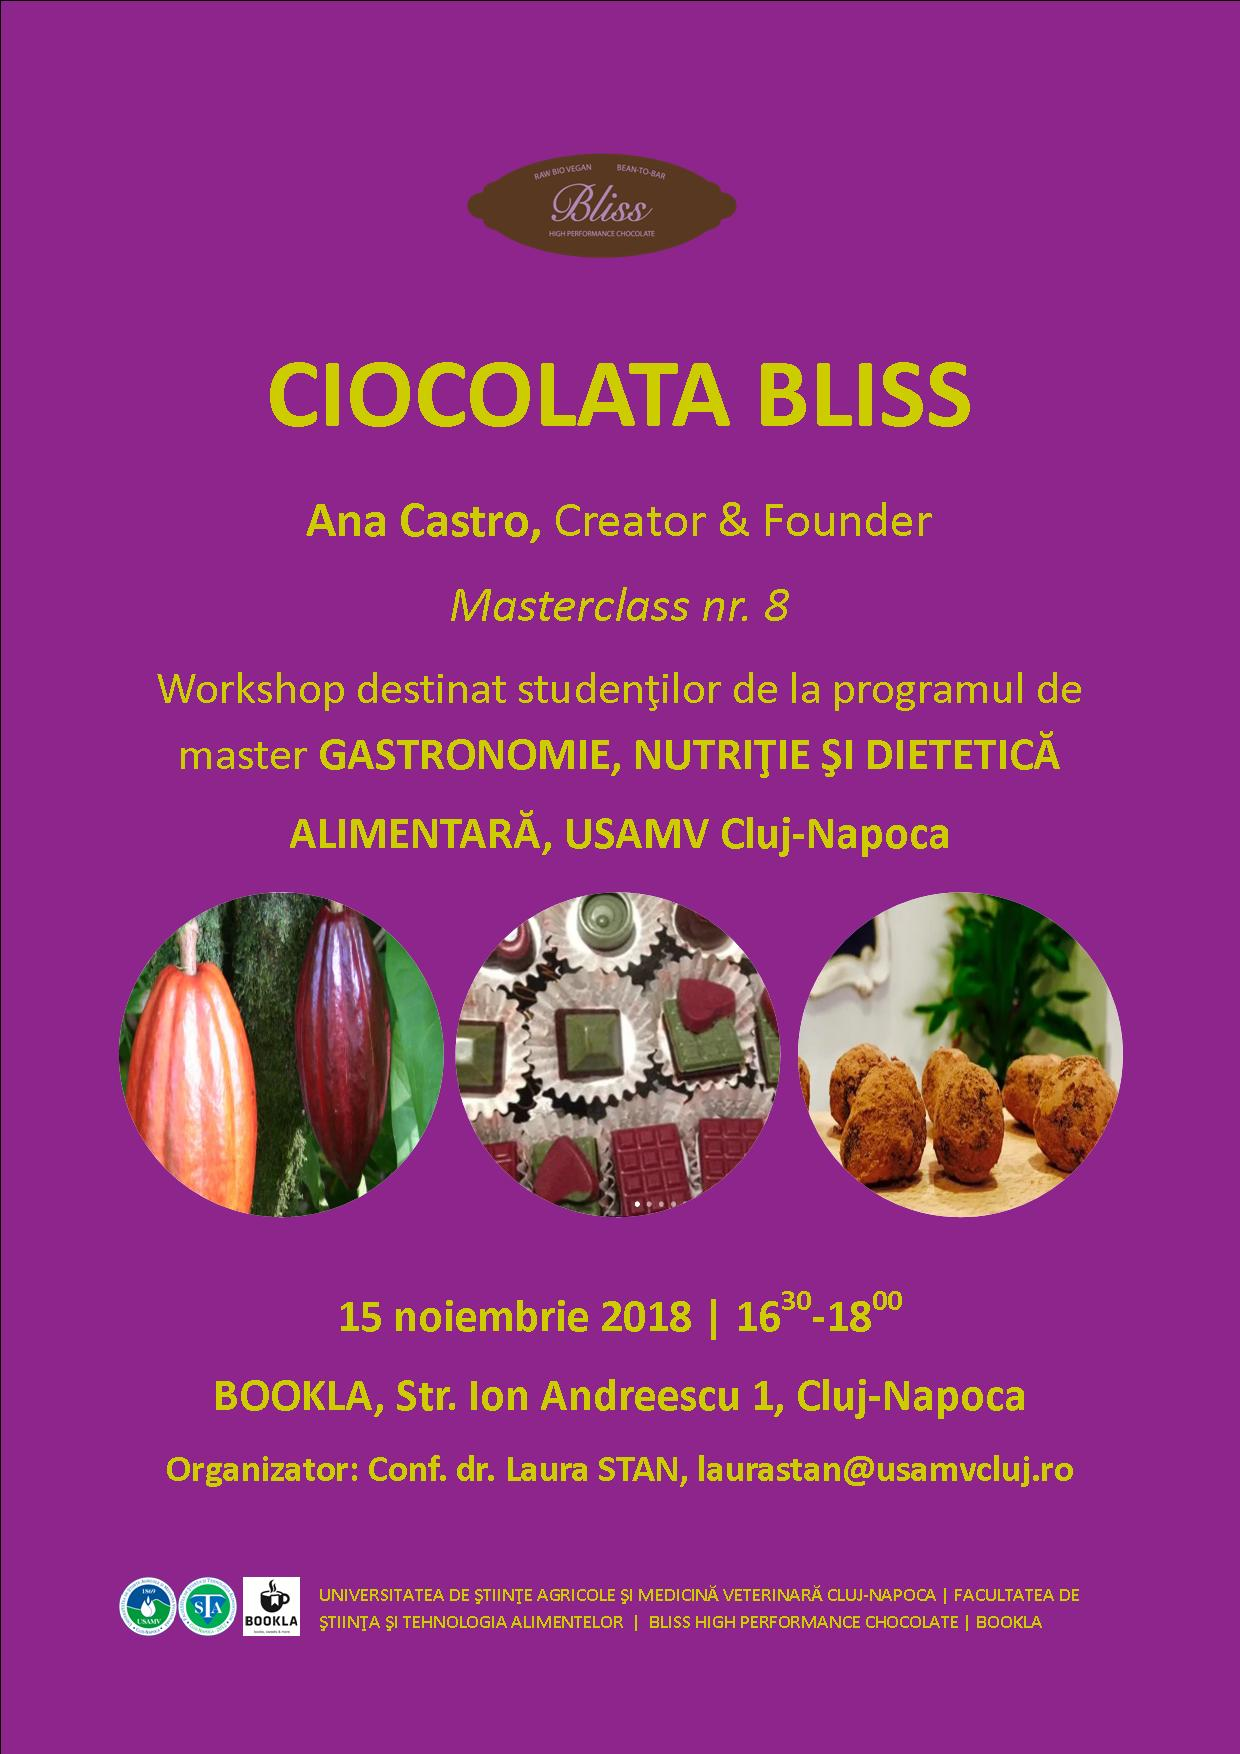 Workshop Ciocolata Bliss